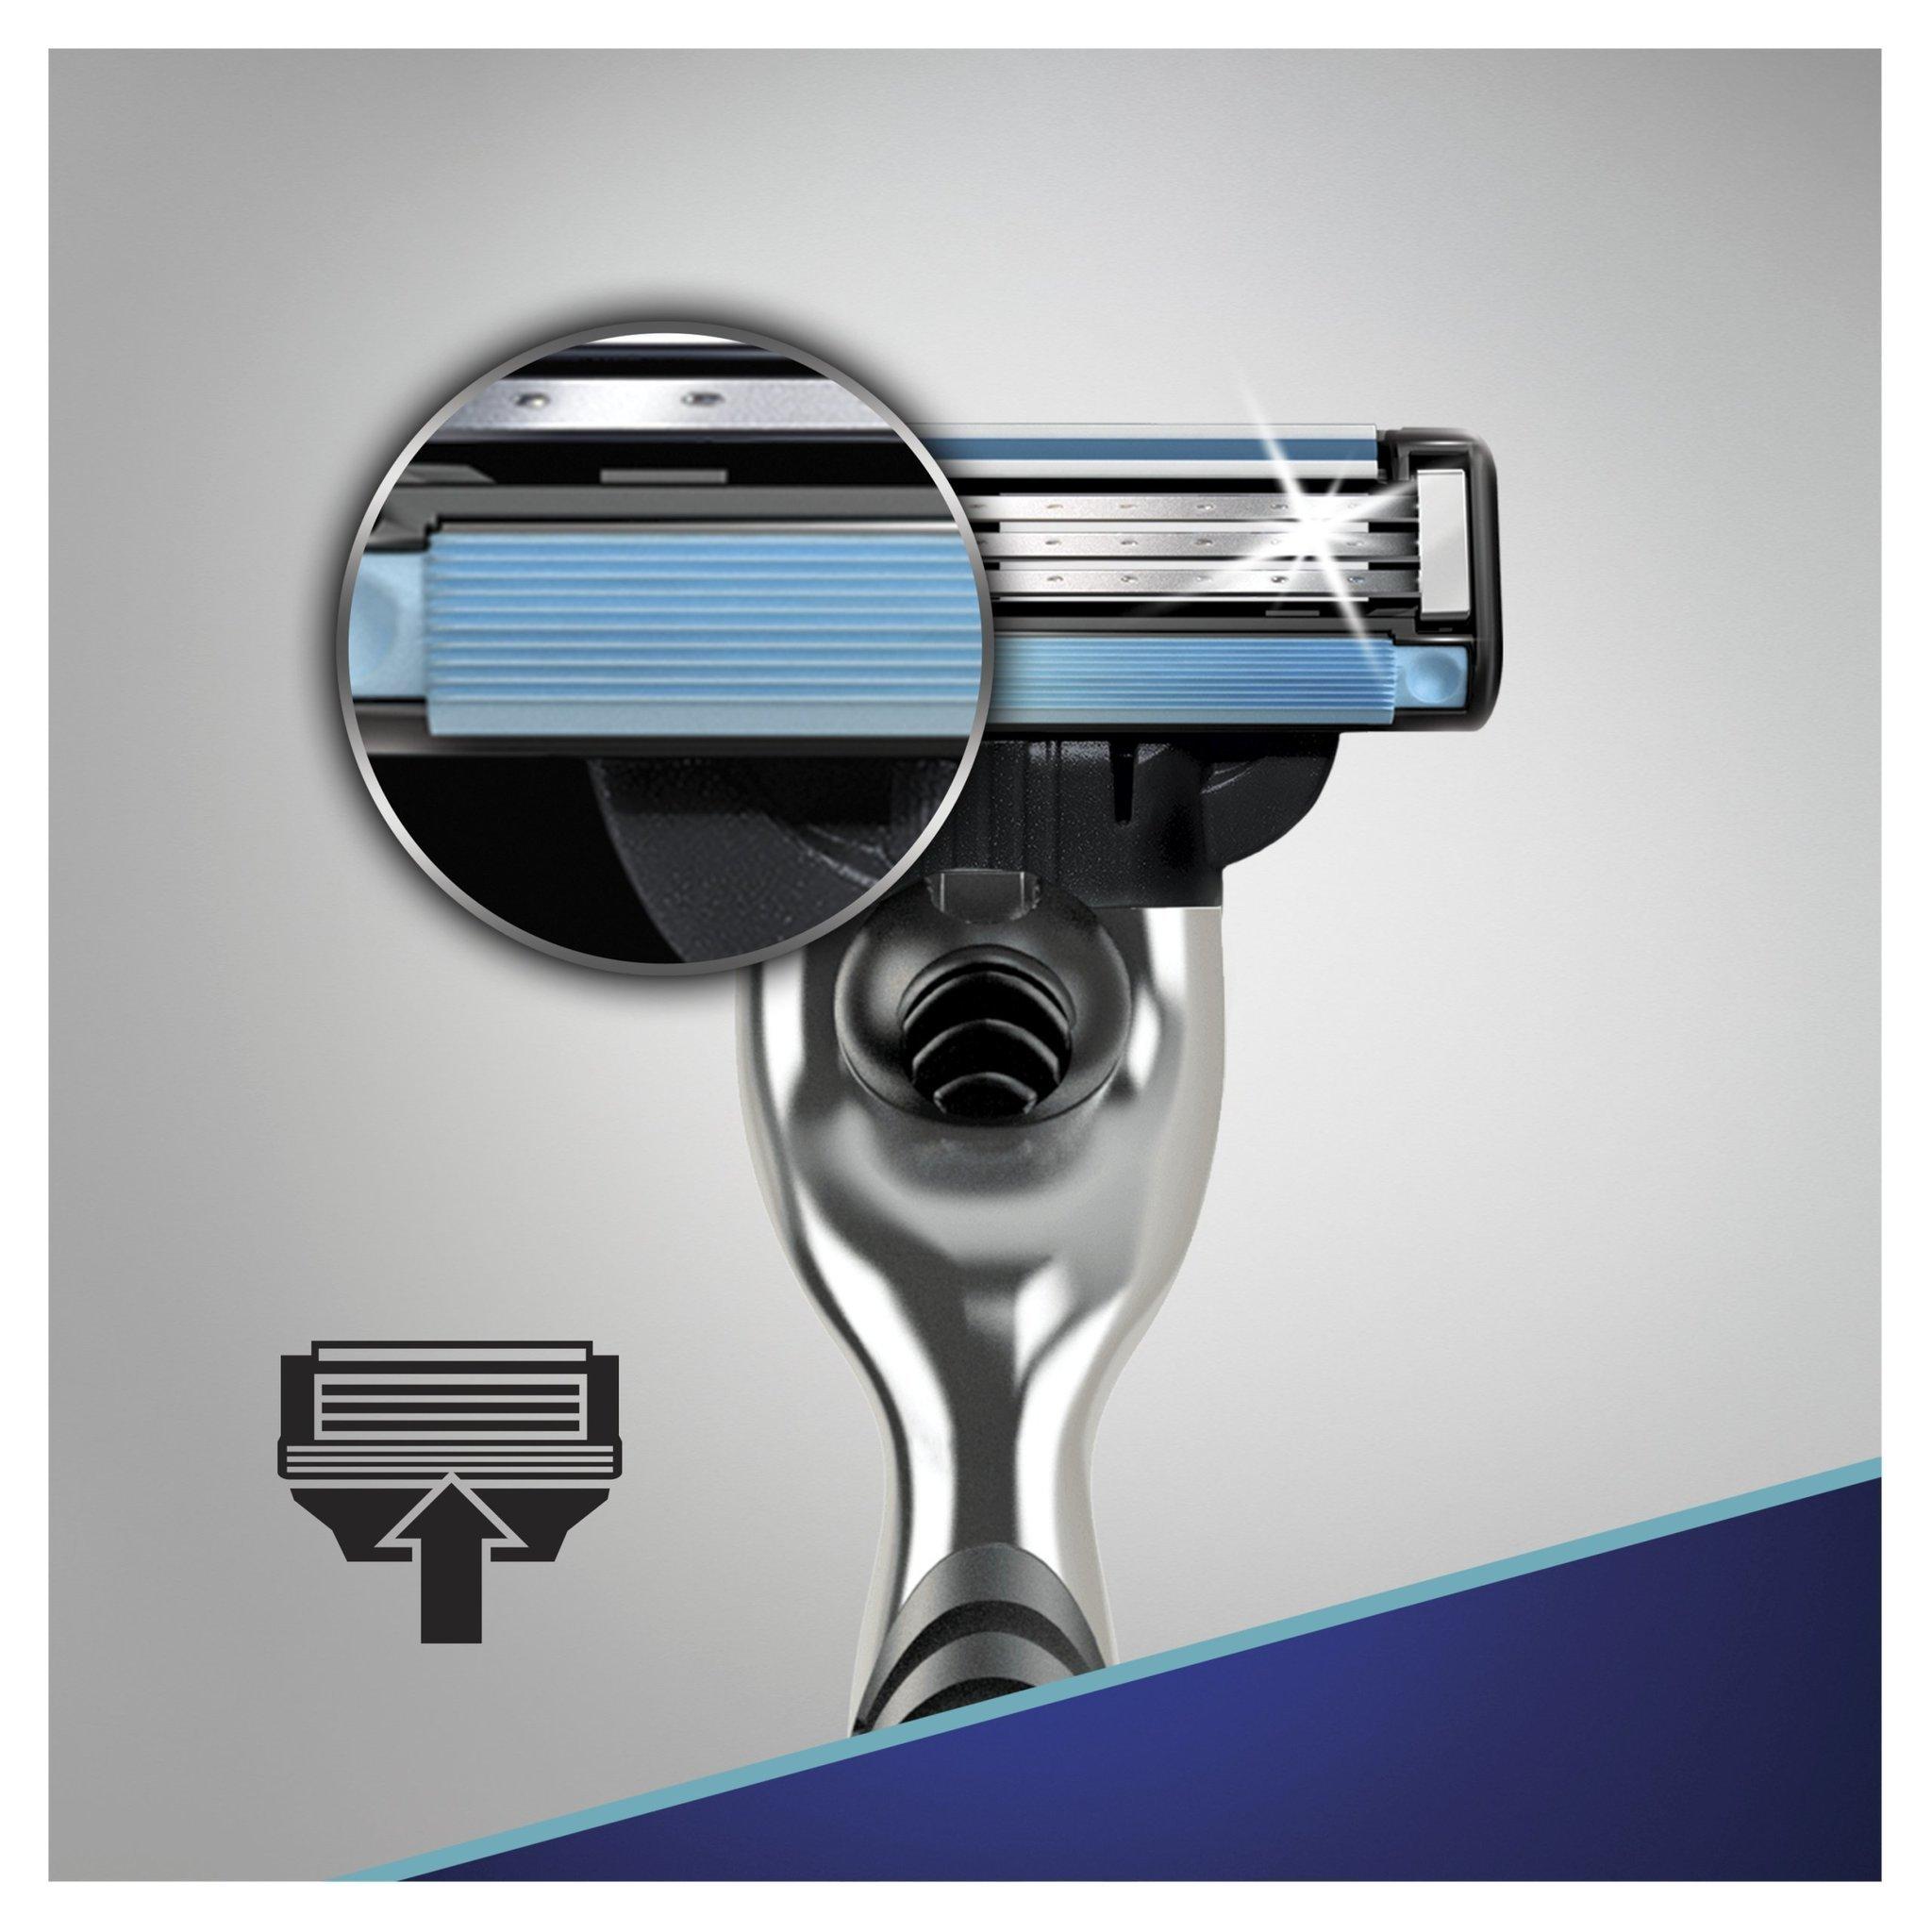 Gillette mach3 комплект (5х8) 40 шт. (Цена за 1 пачку 748р.)